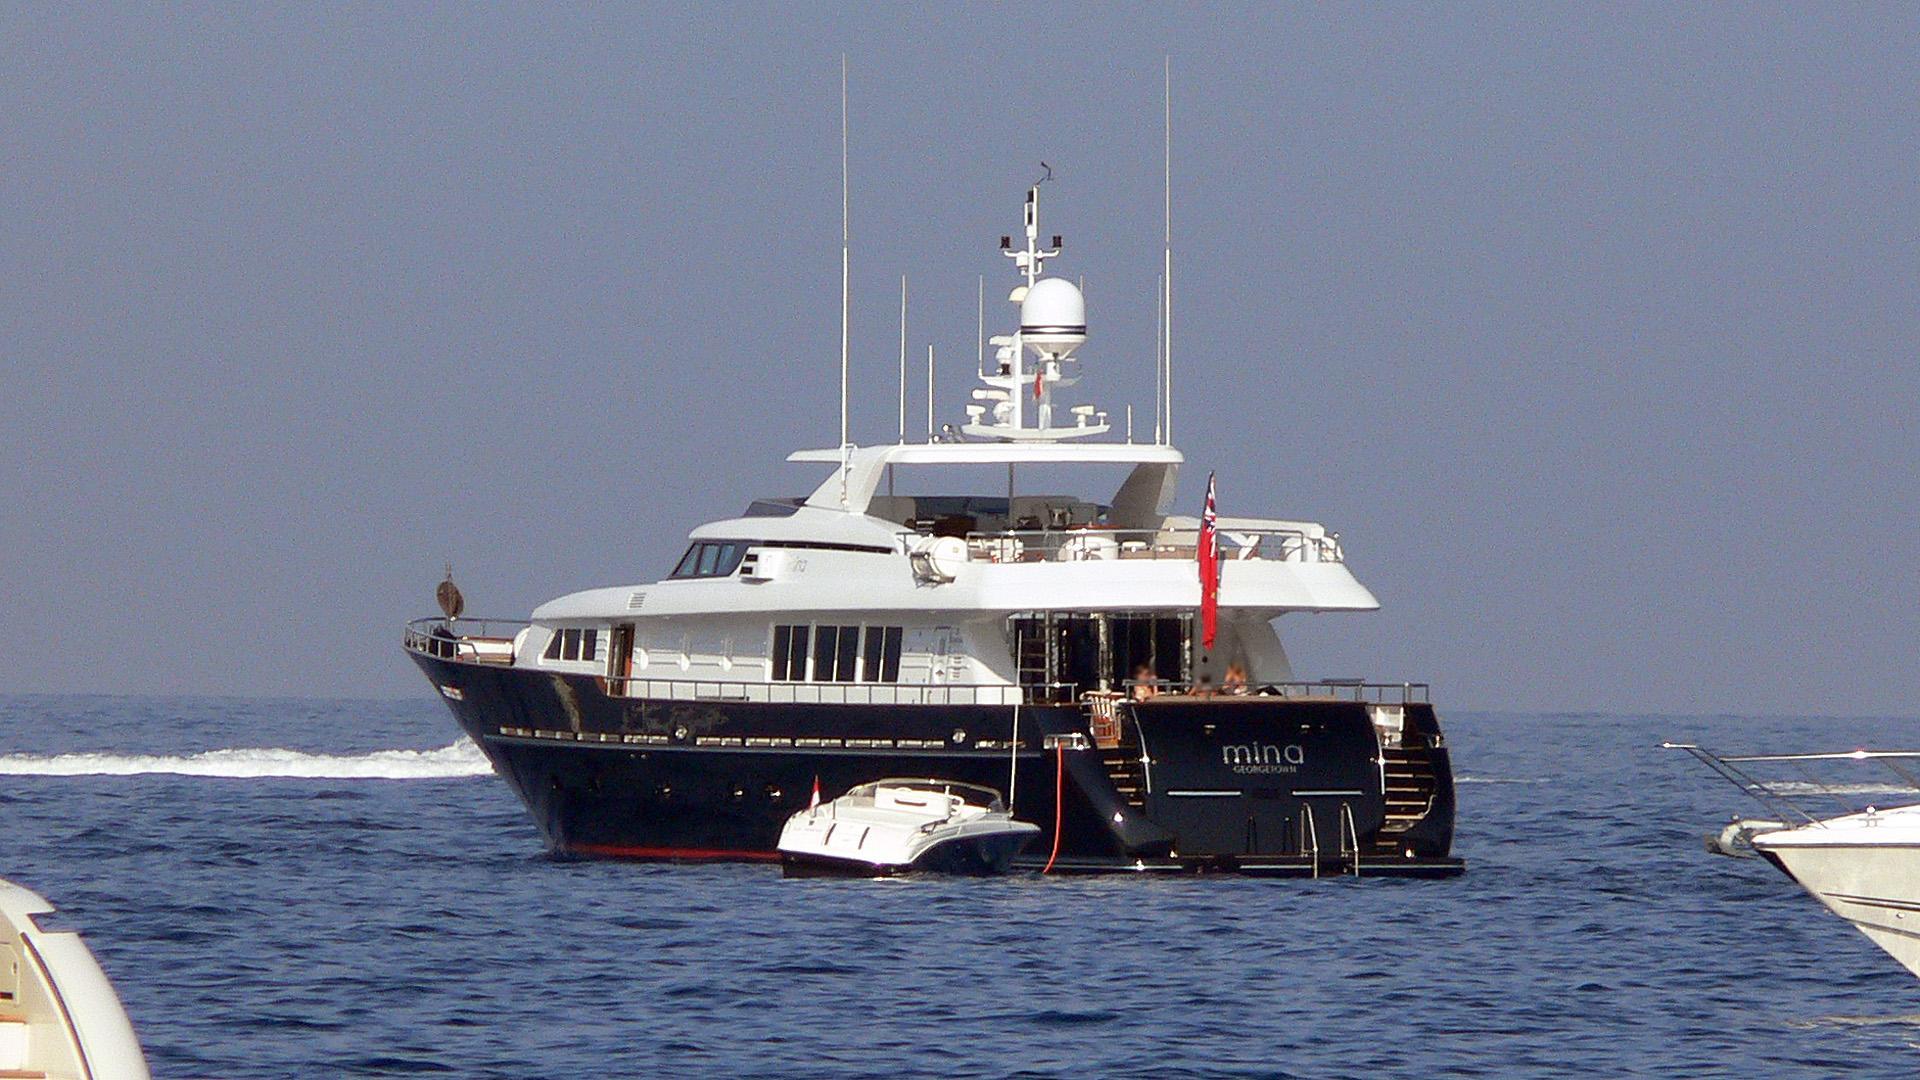 kingfish-mina-motor-yacht-codecasa-2003-35m-stern